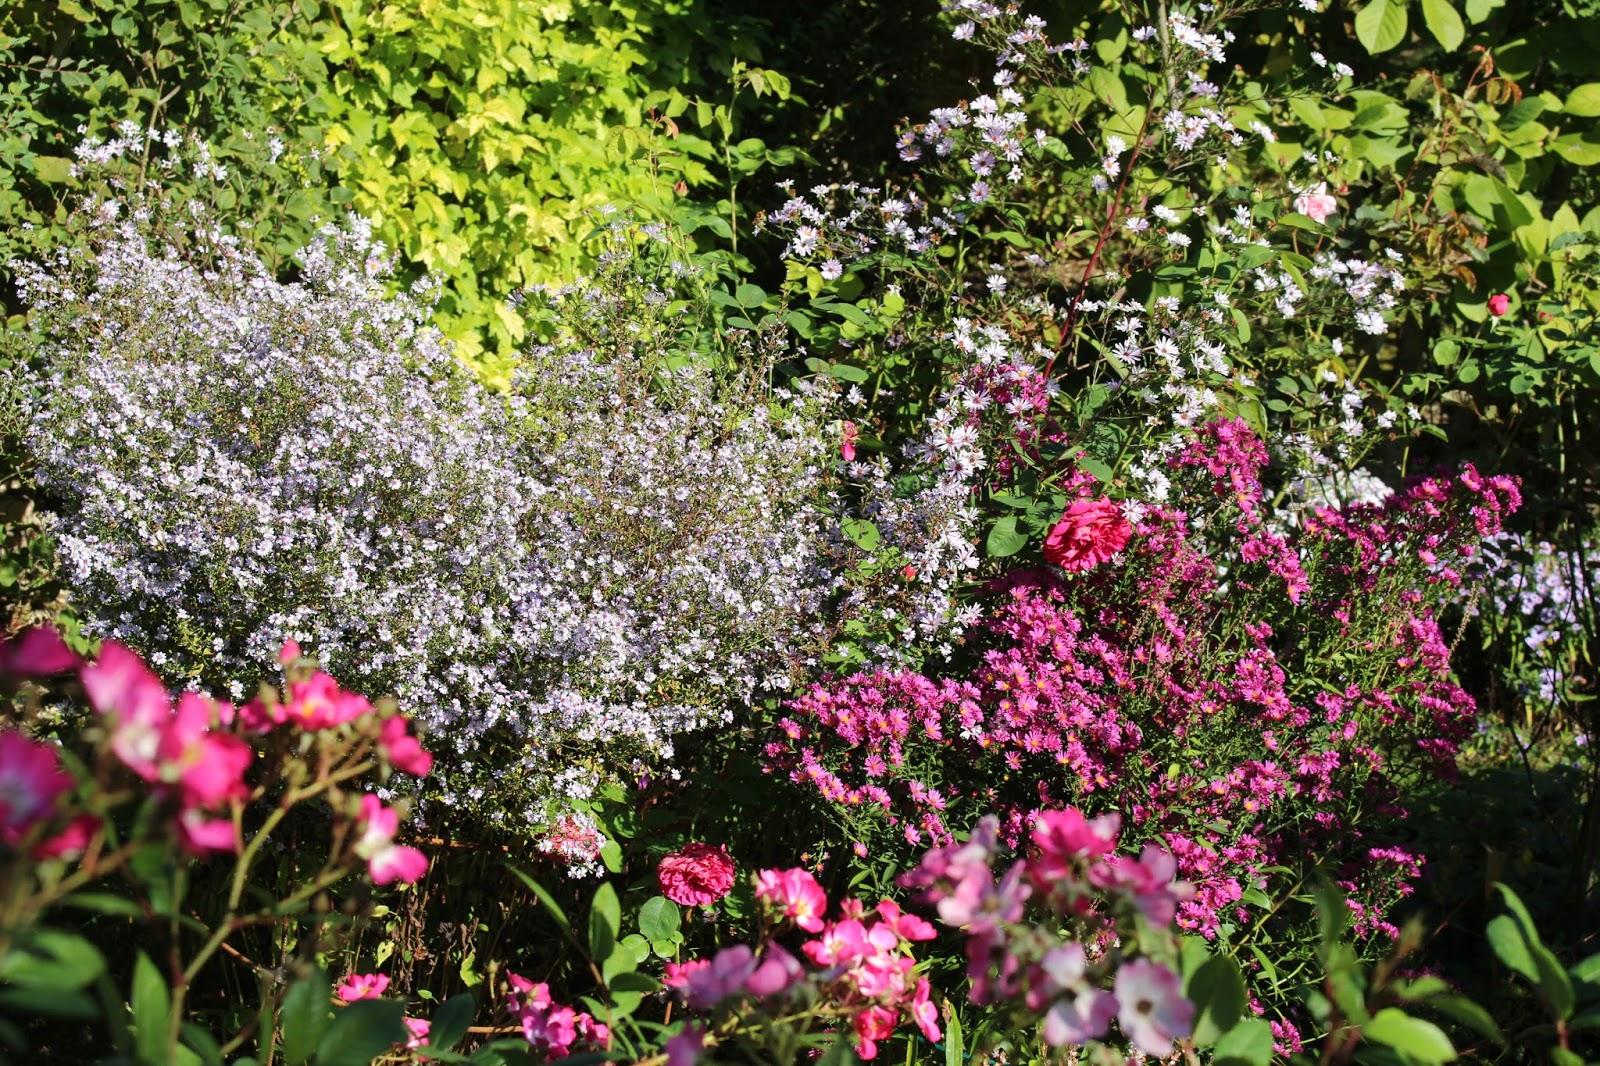 Notre jardin secret for Axelle red jardin secret